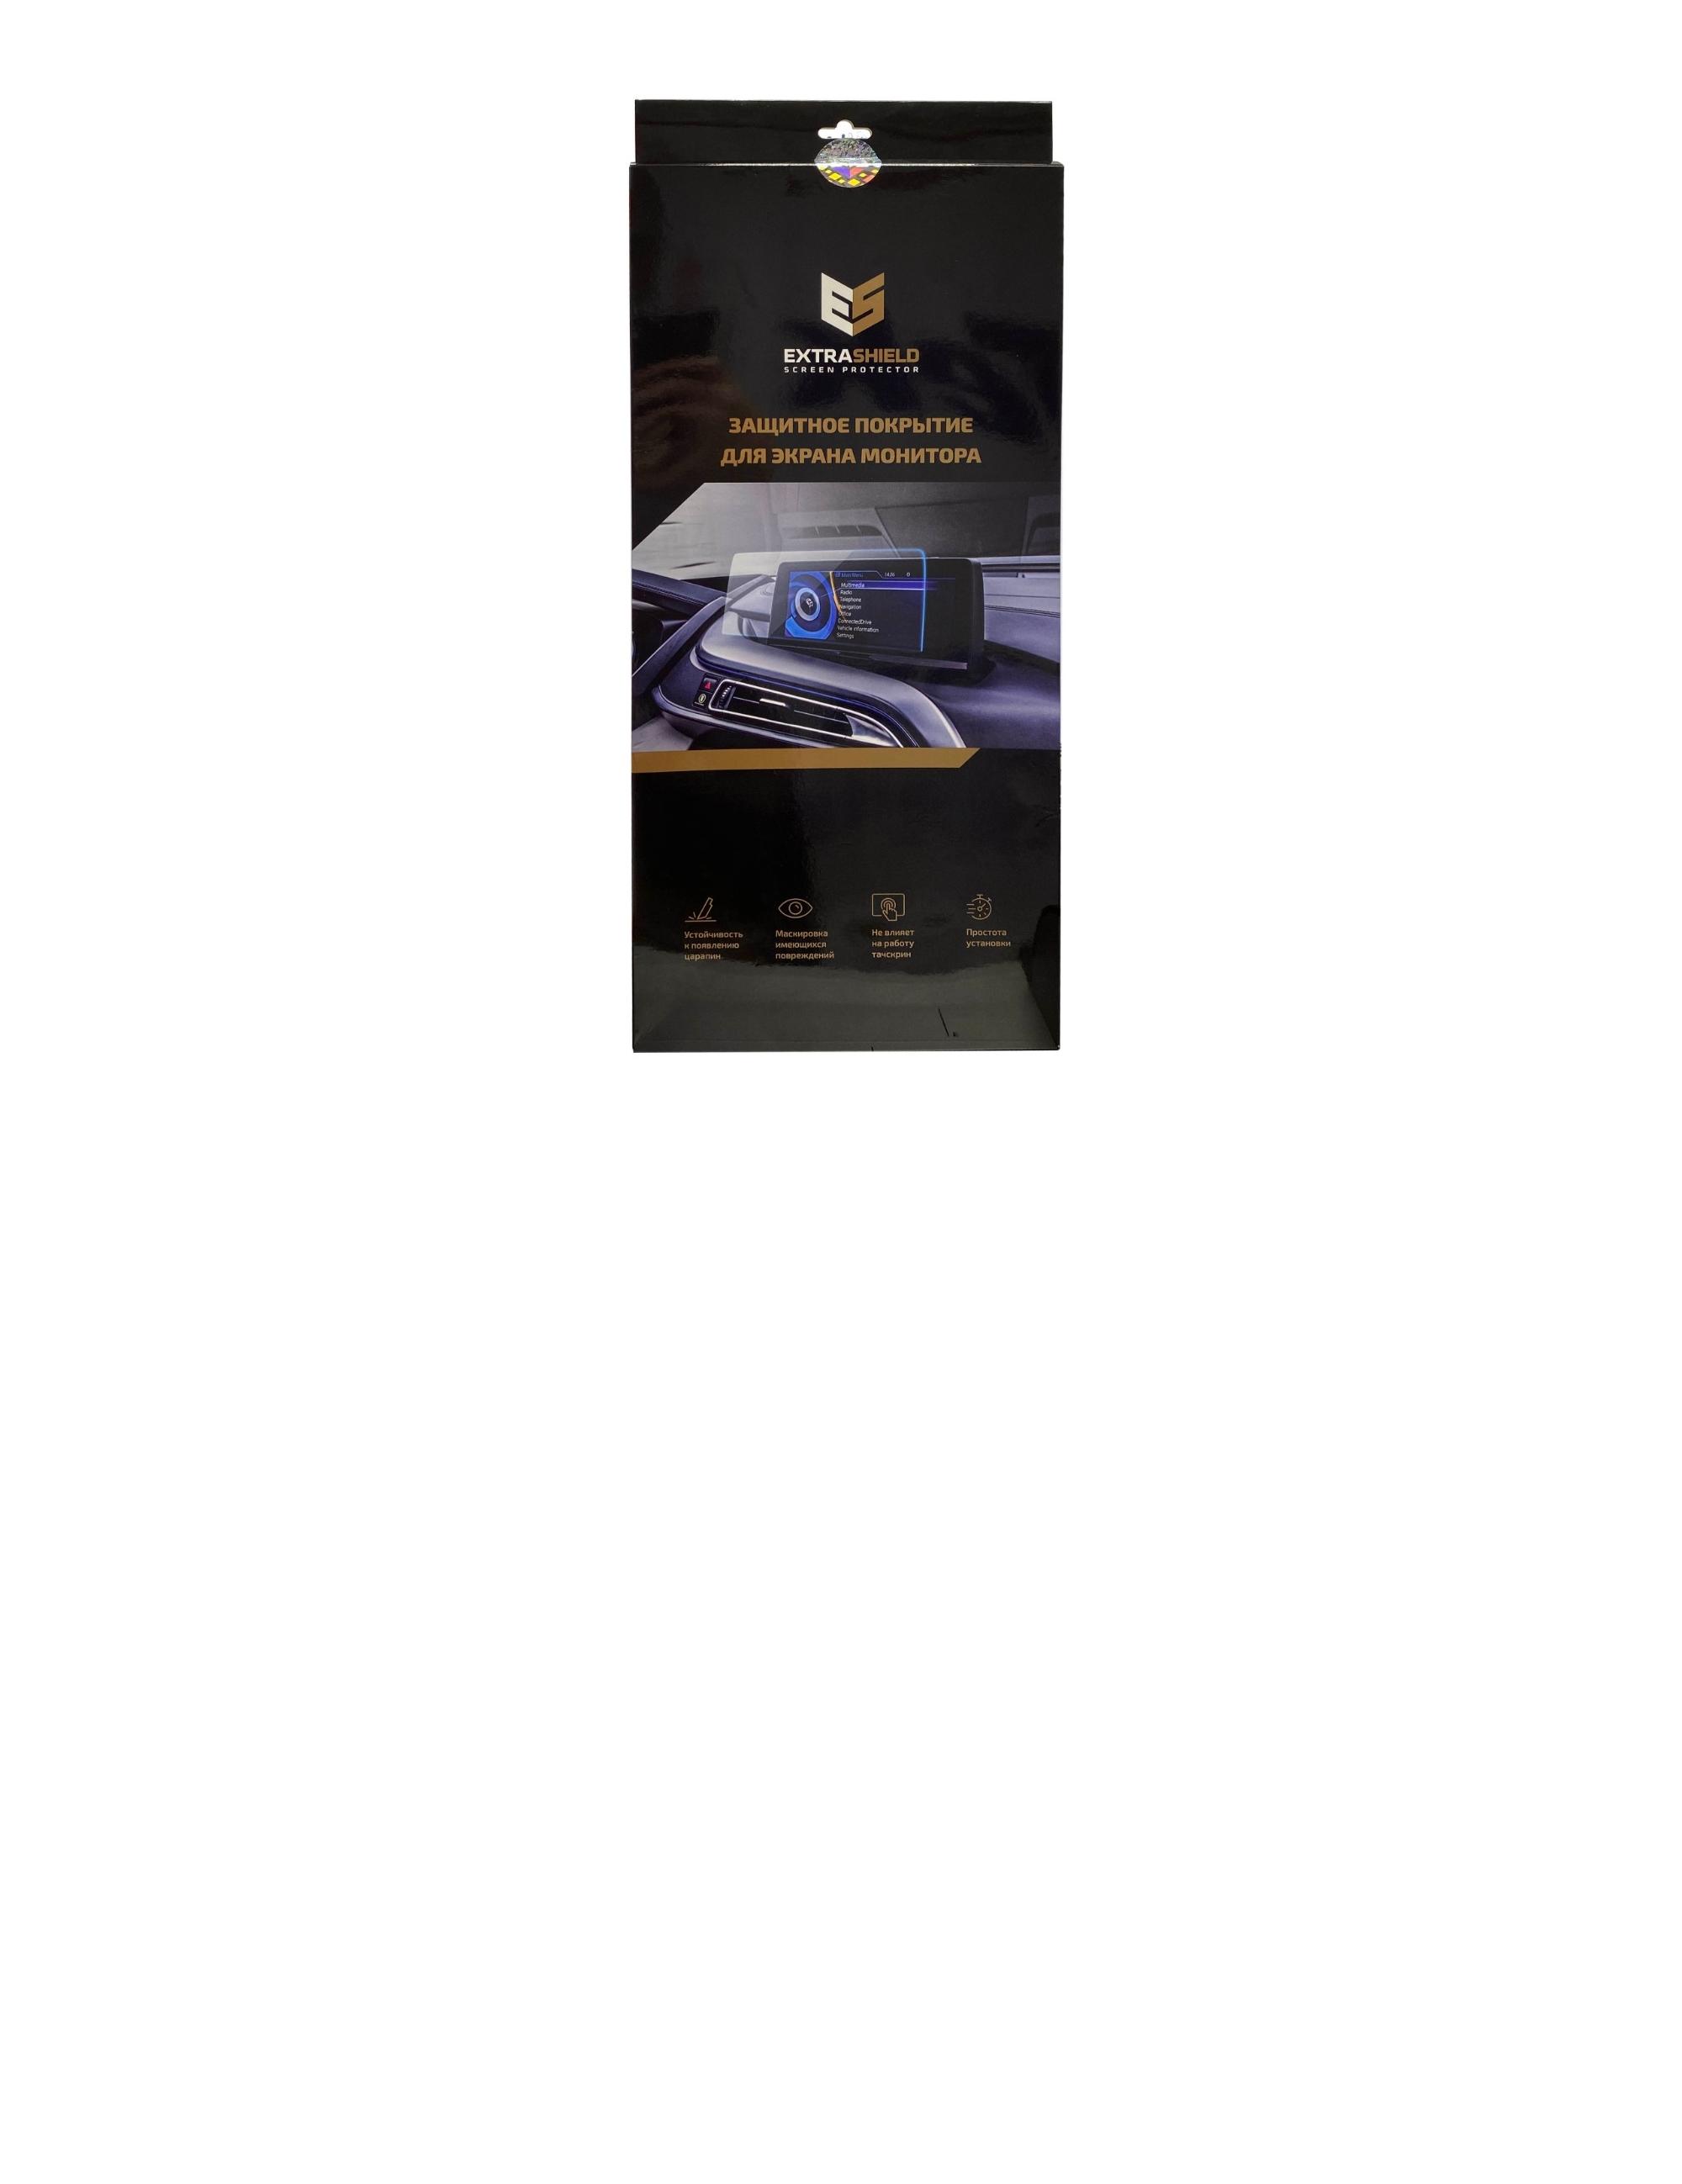 BMW X3 (F25) 2014 - 2017 мультимедиа 6.5 Защитное стекло Глянец